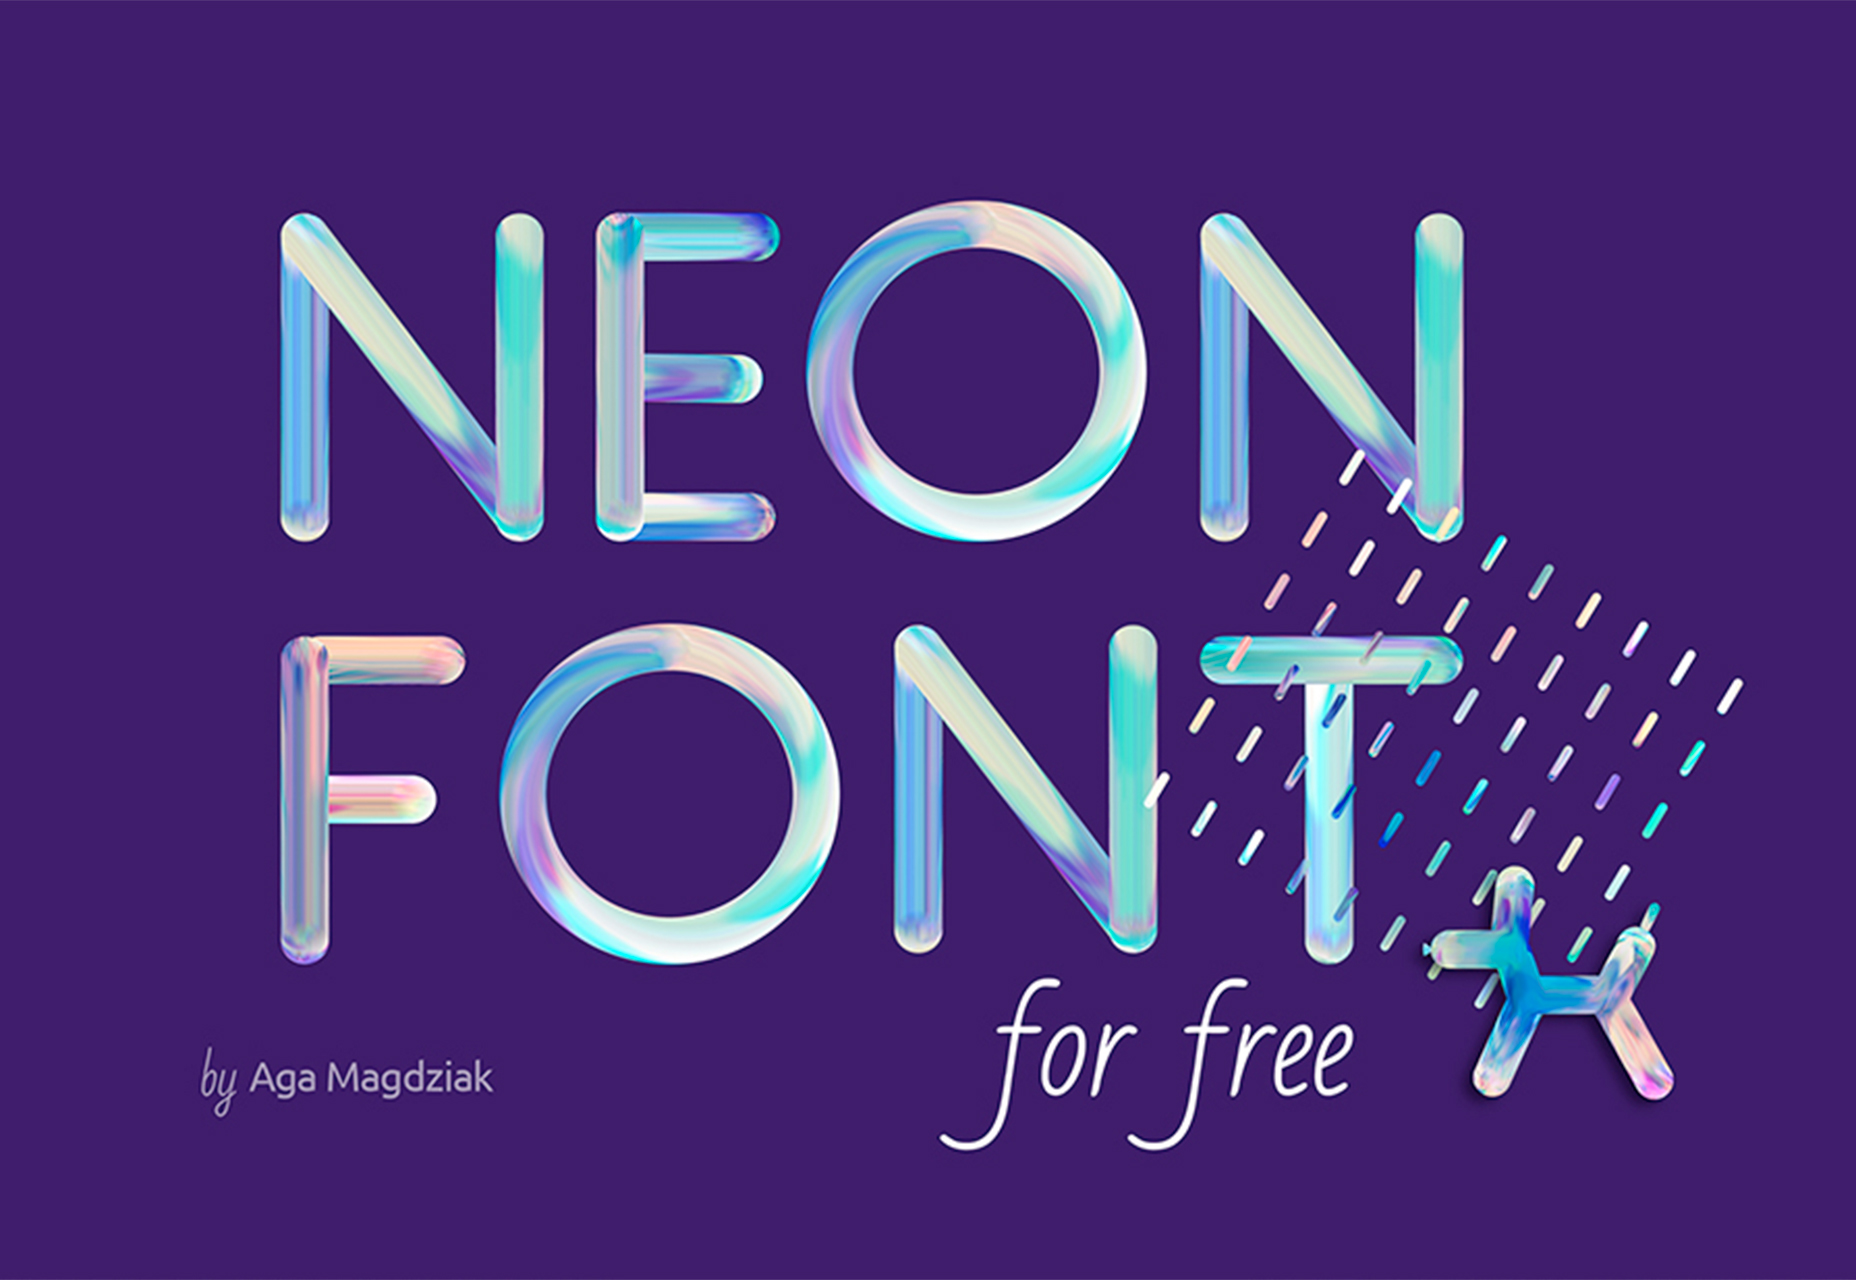 neon-font